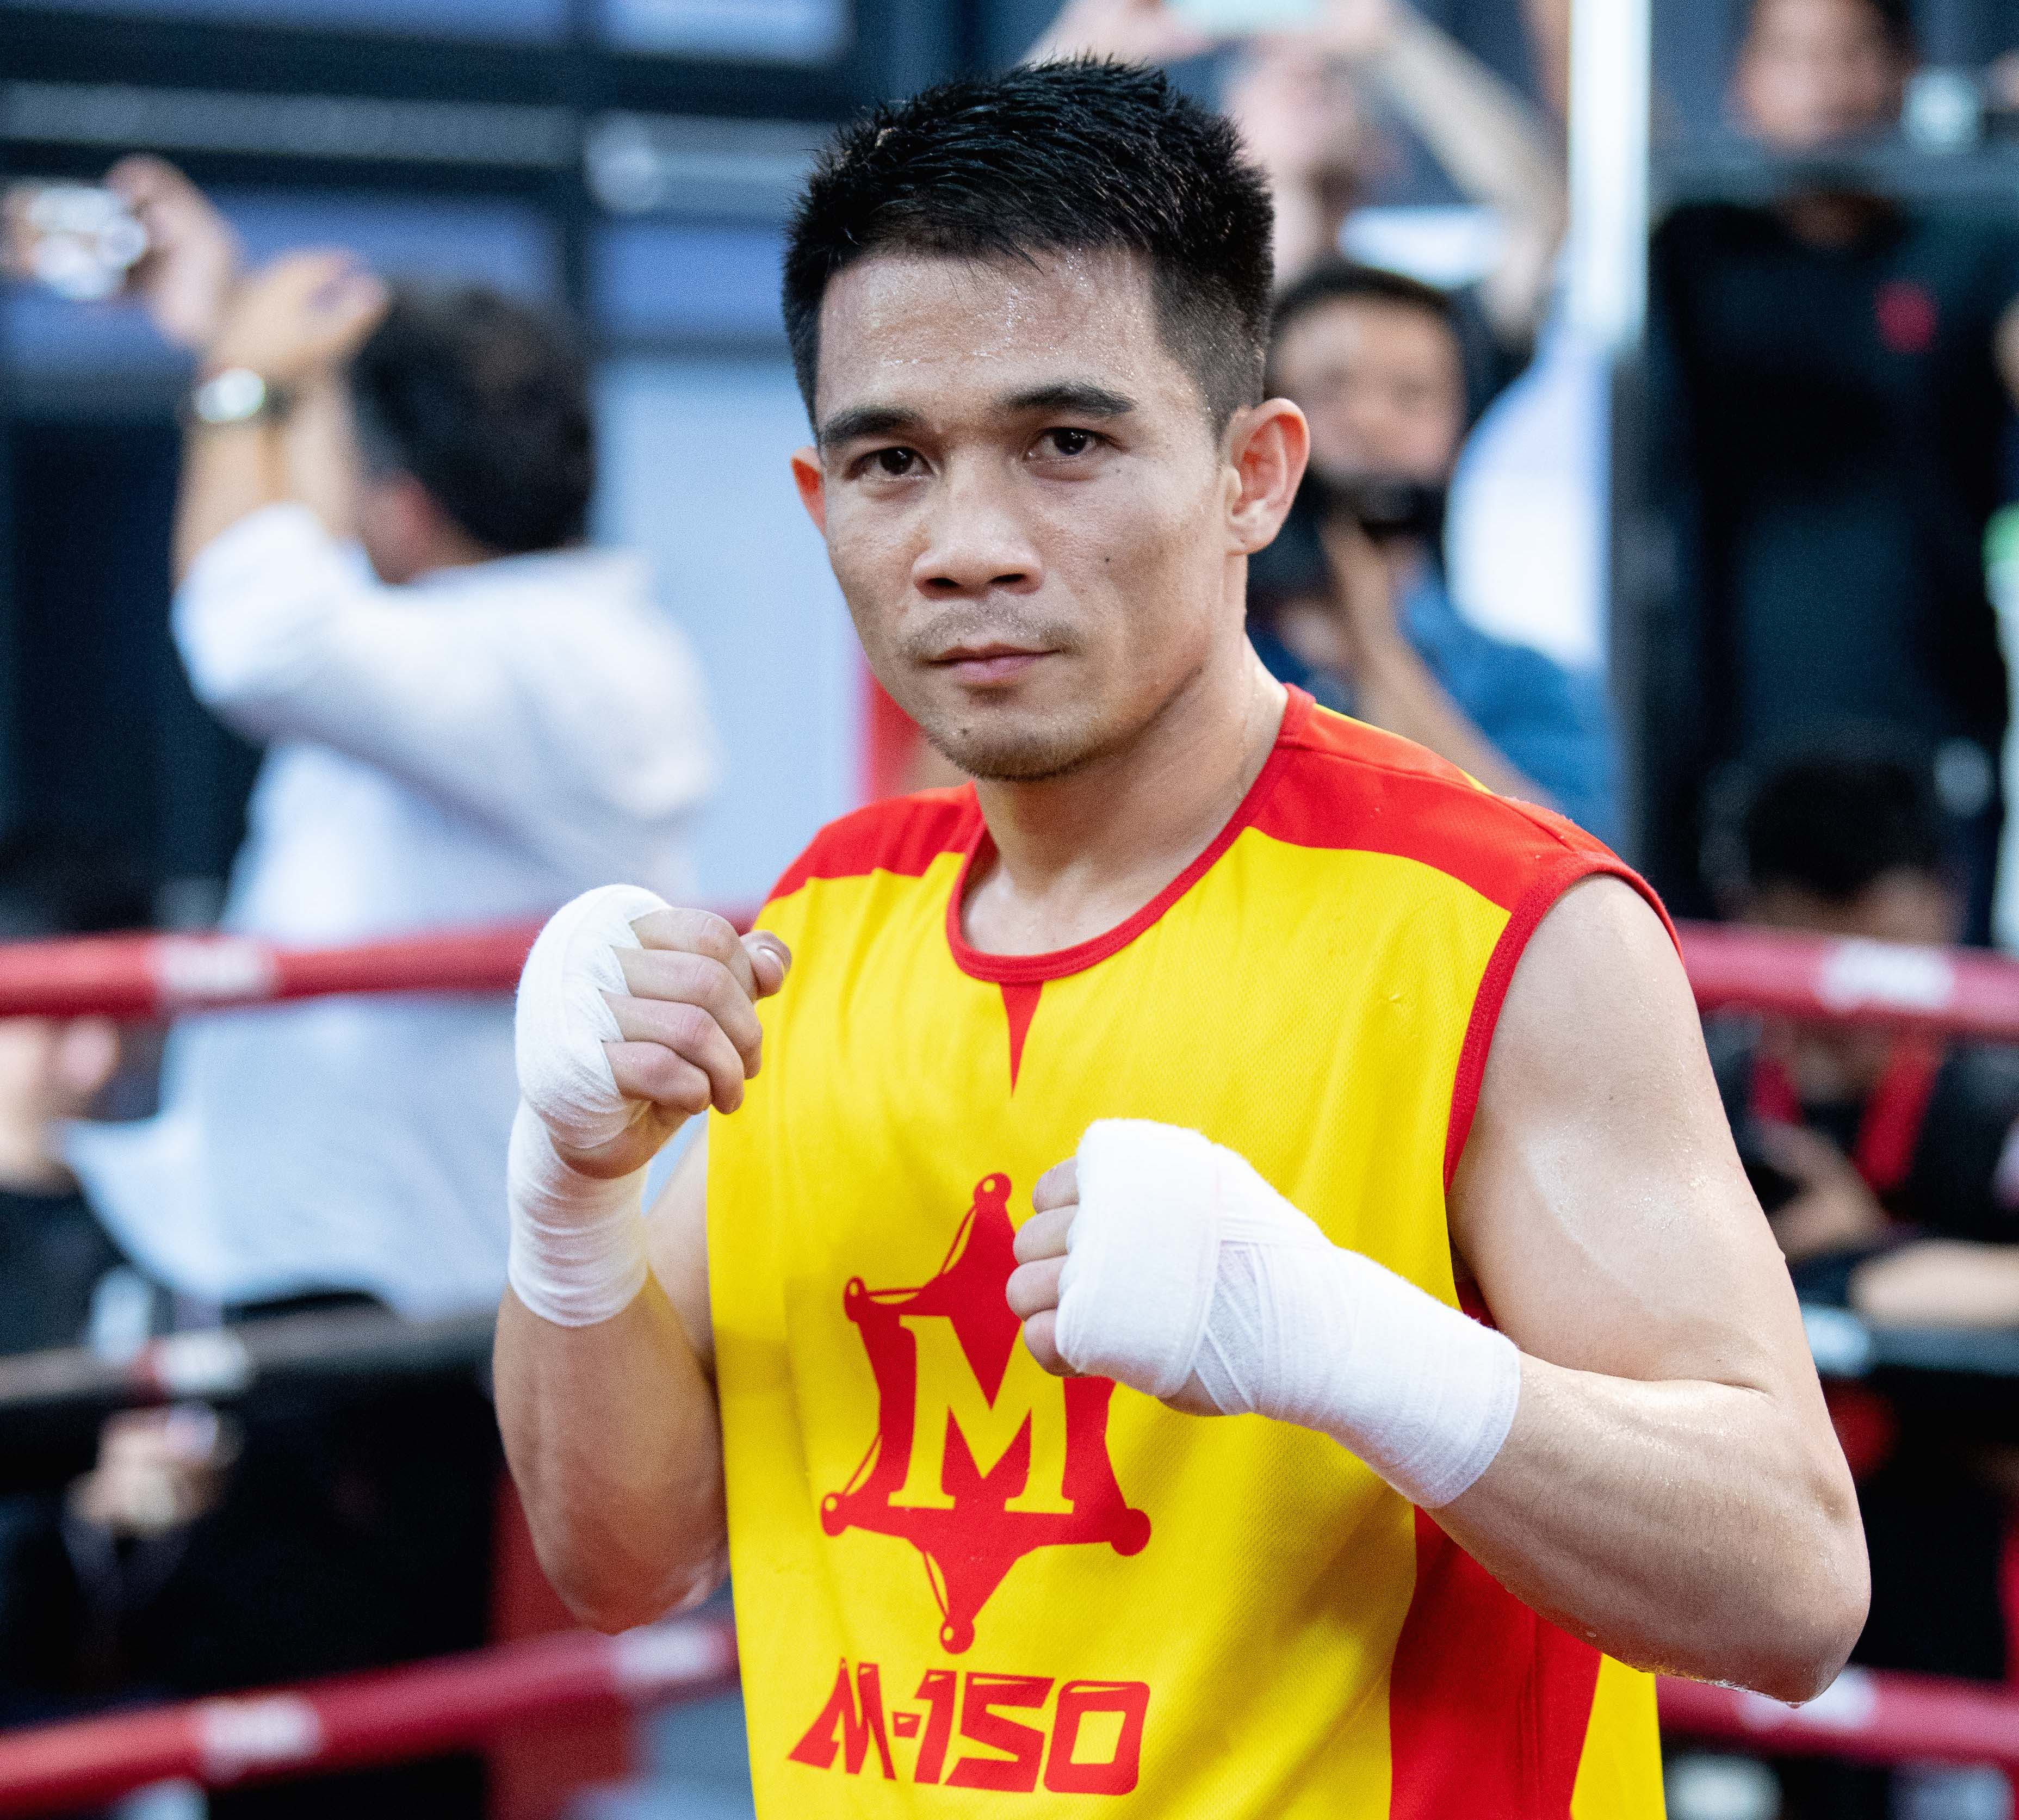 Srisaket Sor Rungvisai on Manny Pacquiao: 'He is my hero' - srisaket